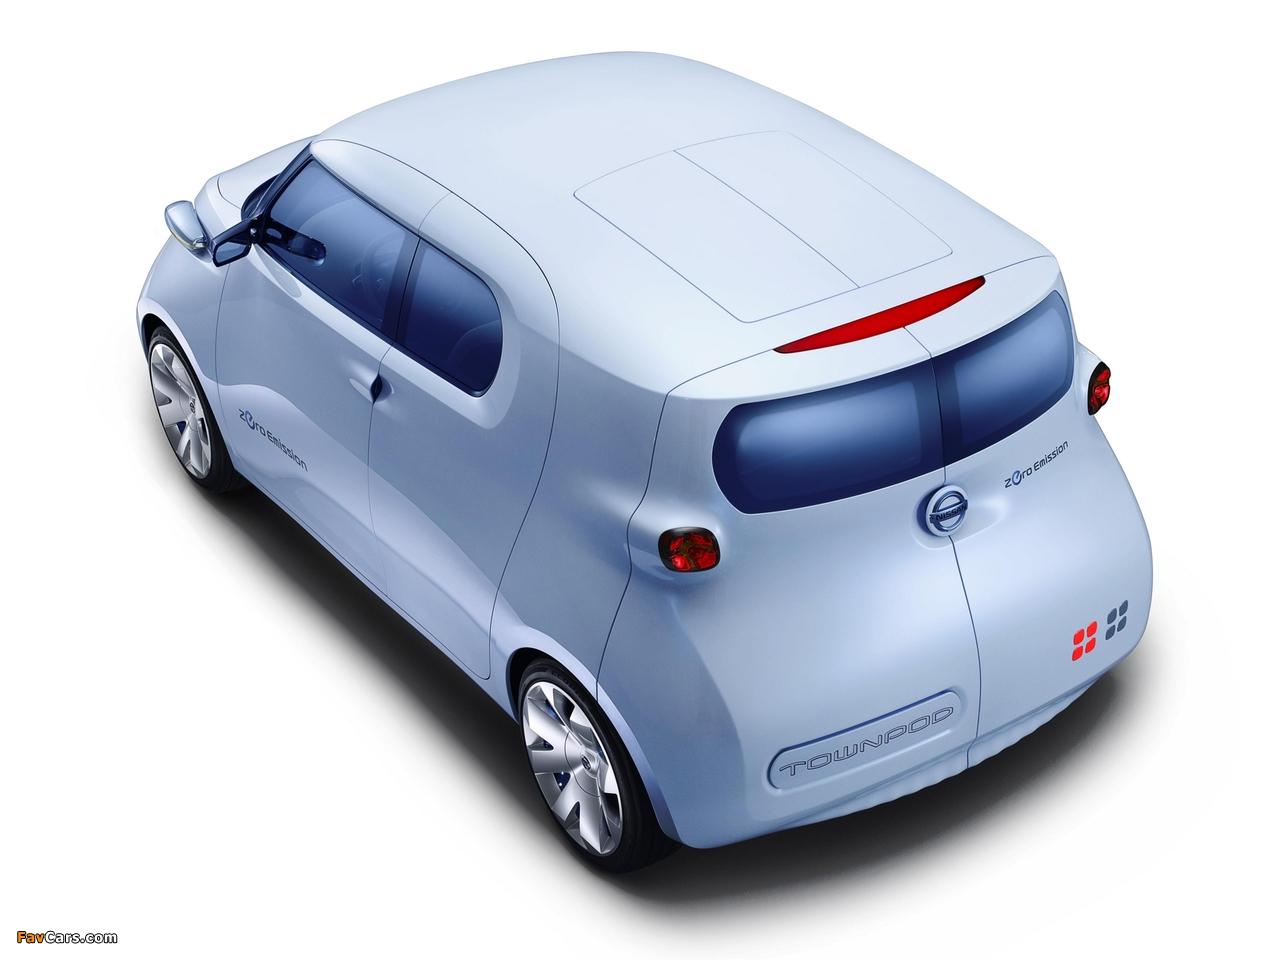 Nissan Townpod Concept 2010 photos (1280 x 960)